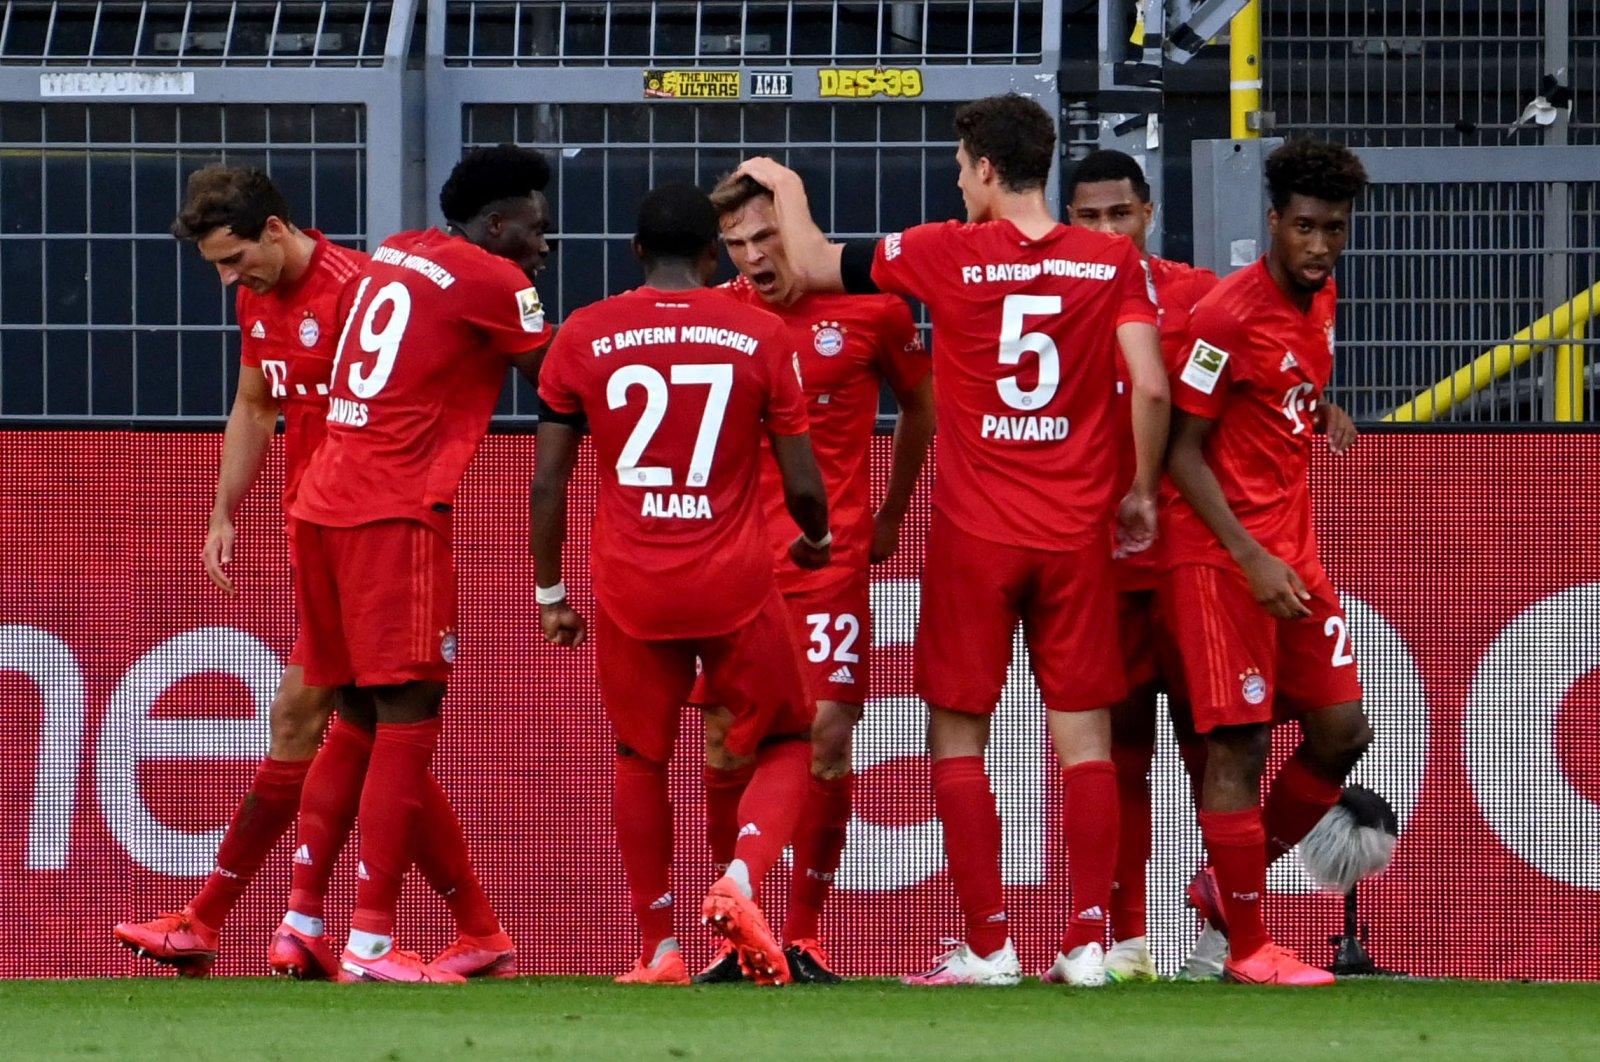 Joshua Kimmich (C) of Bayern Munich celebrates with teammates after scoring the 0-1 goal during a match between Borussia Dortmund and FC Bayern Munich at Signal Iduna Park in Dortmund, Germany, May 26, 2020. (EPA Photo)